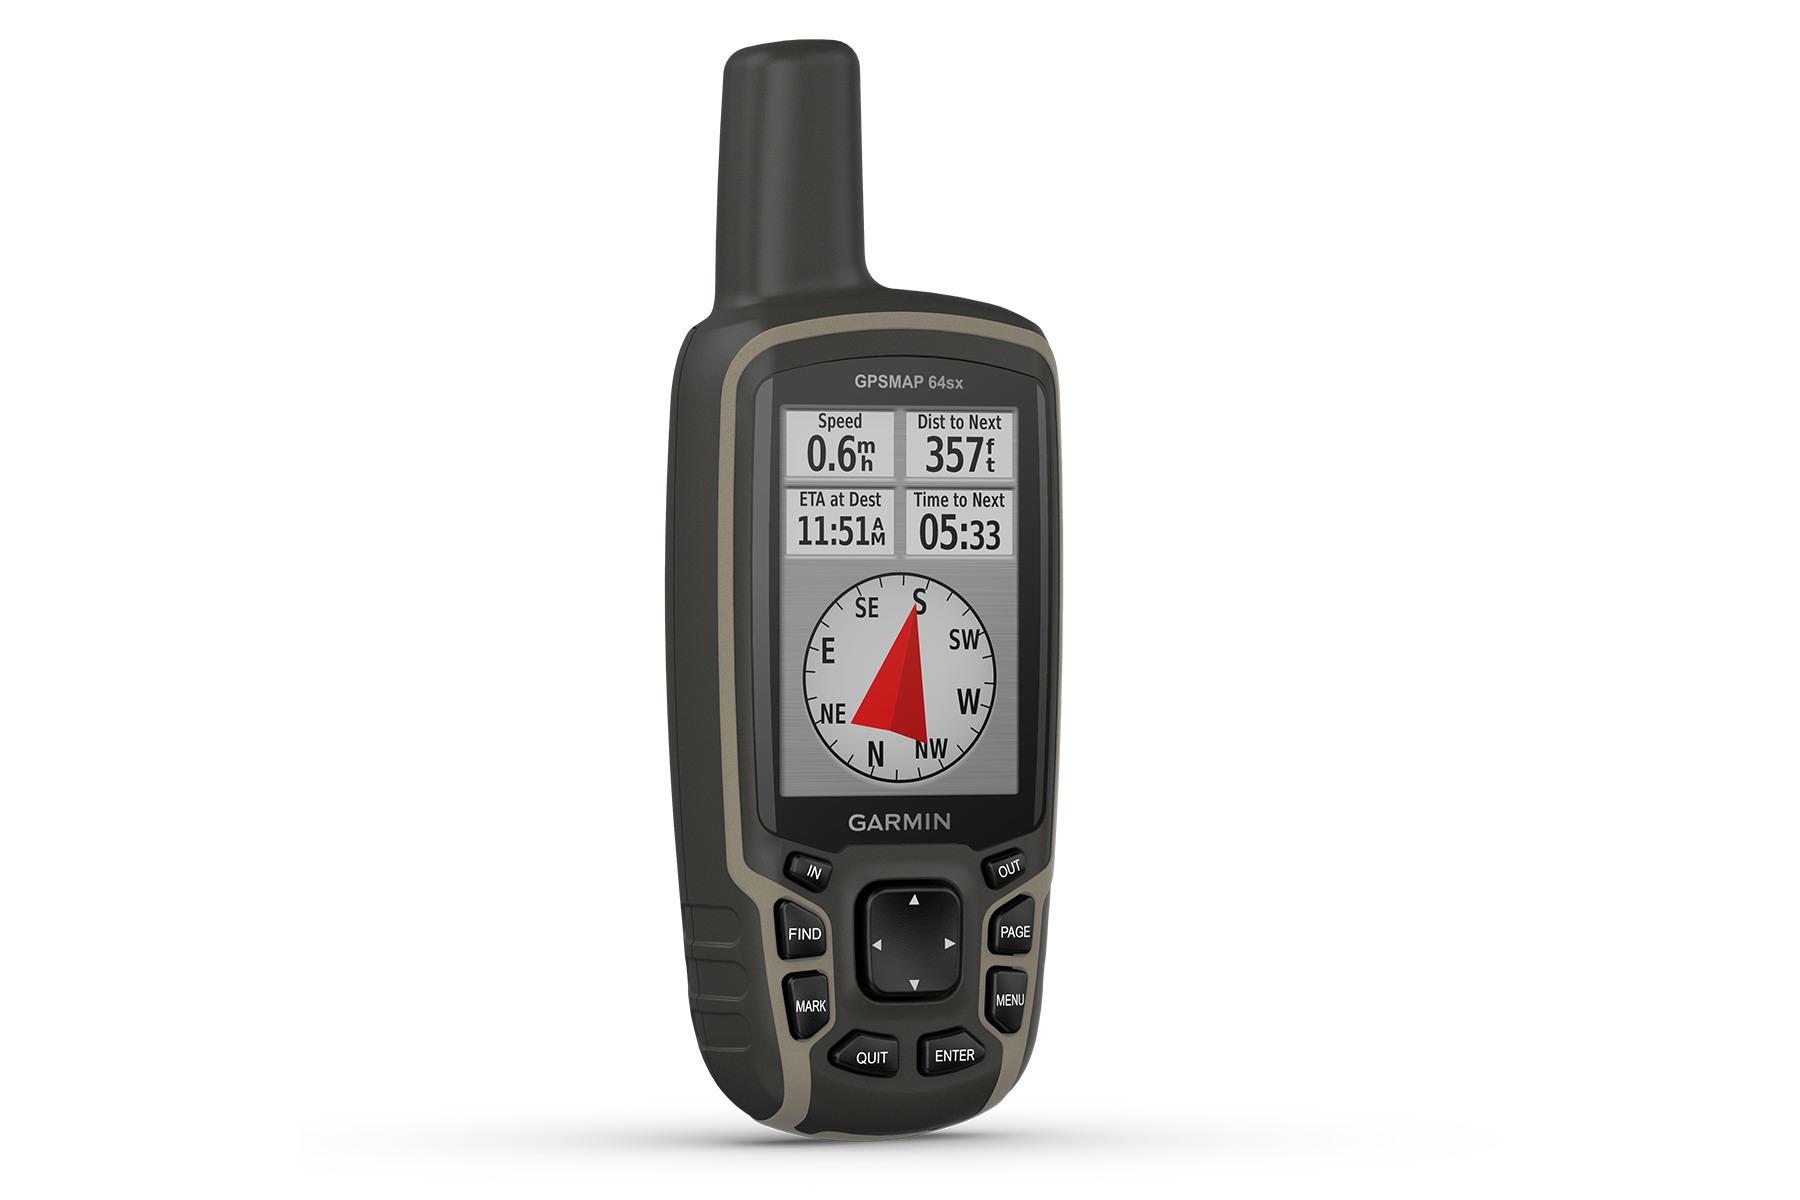 Garmin GPSMAP 64sx Navigationsgerät